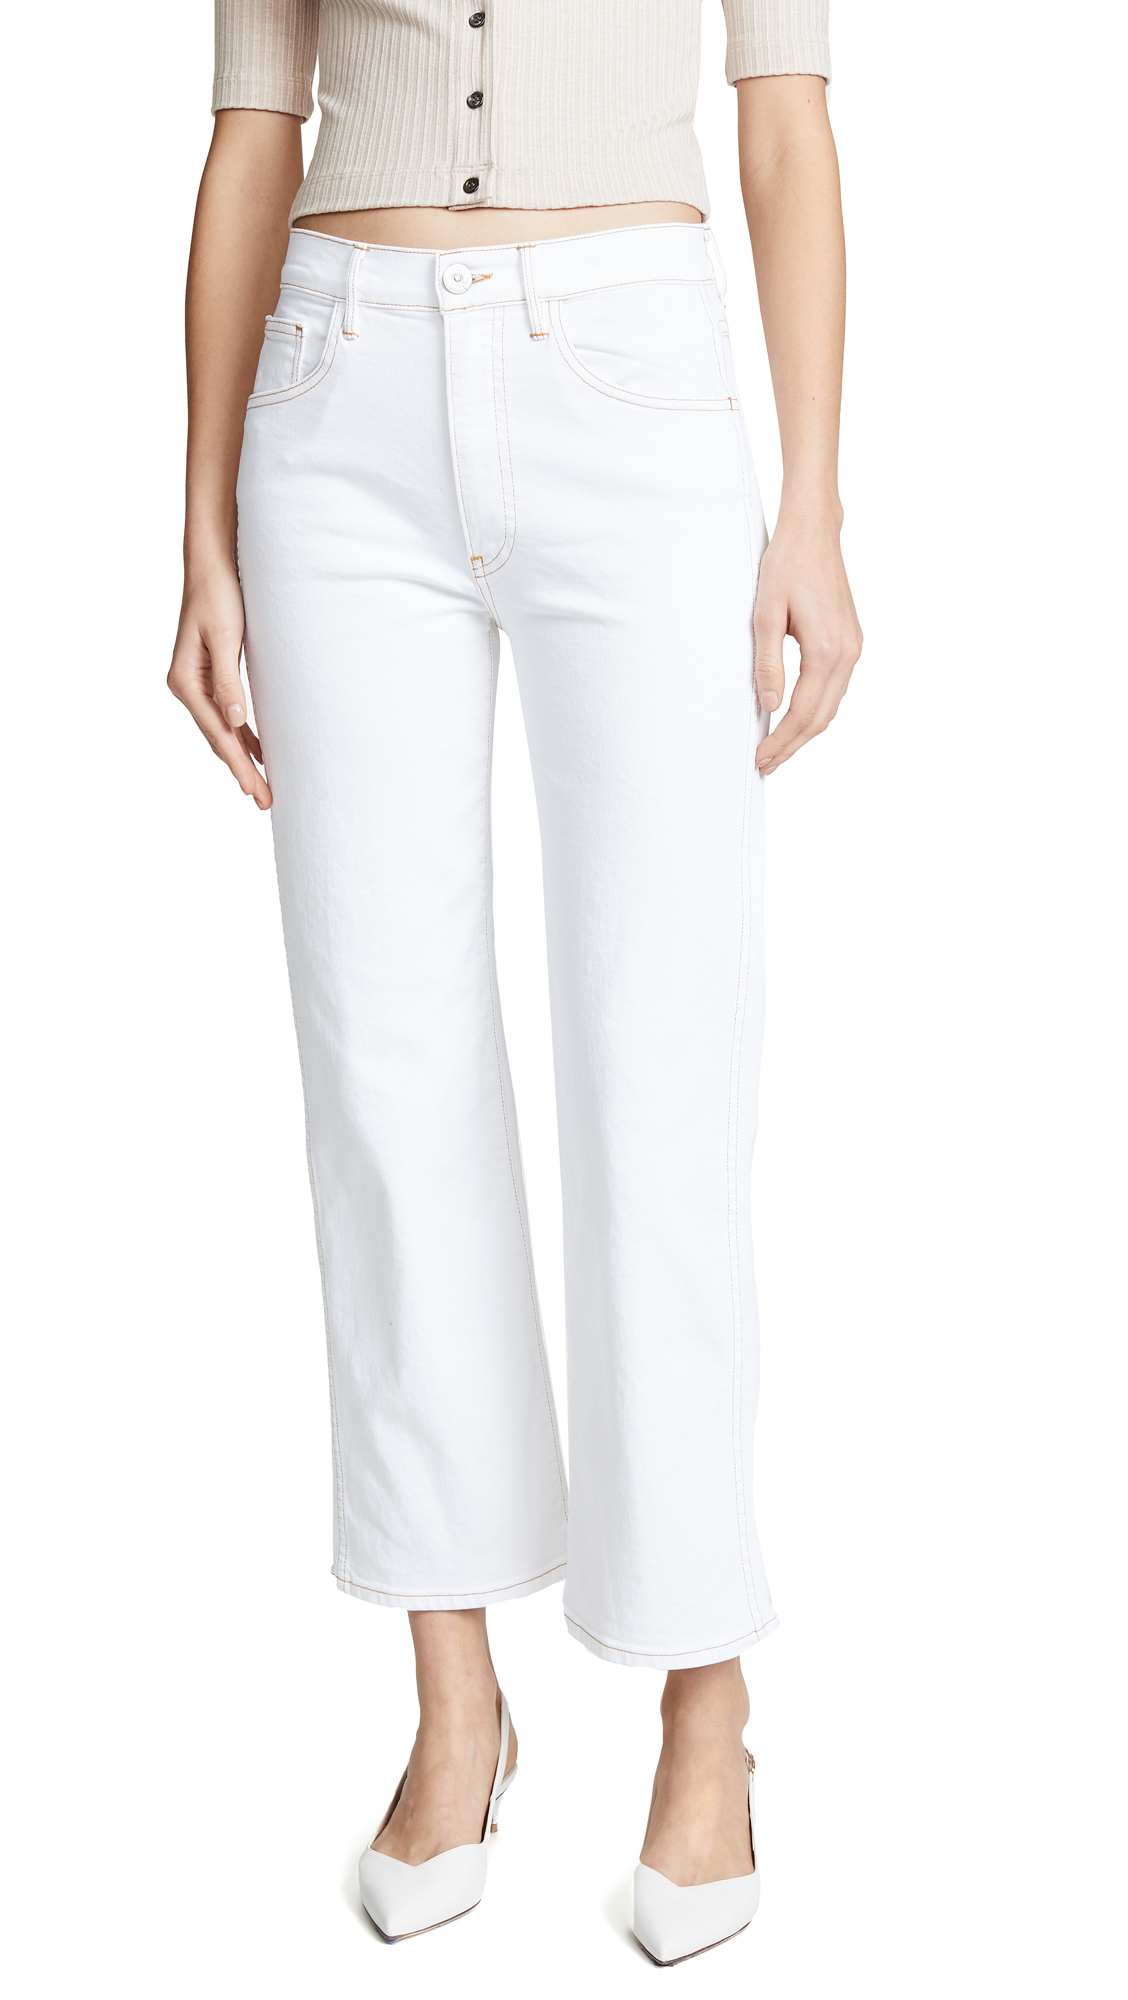 acc8f363a361 3X1 Joni High-Rise Crop Wide-Leg Jeans In Winter White